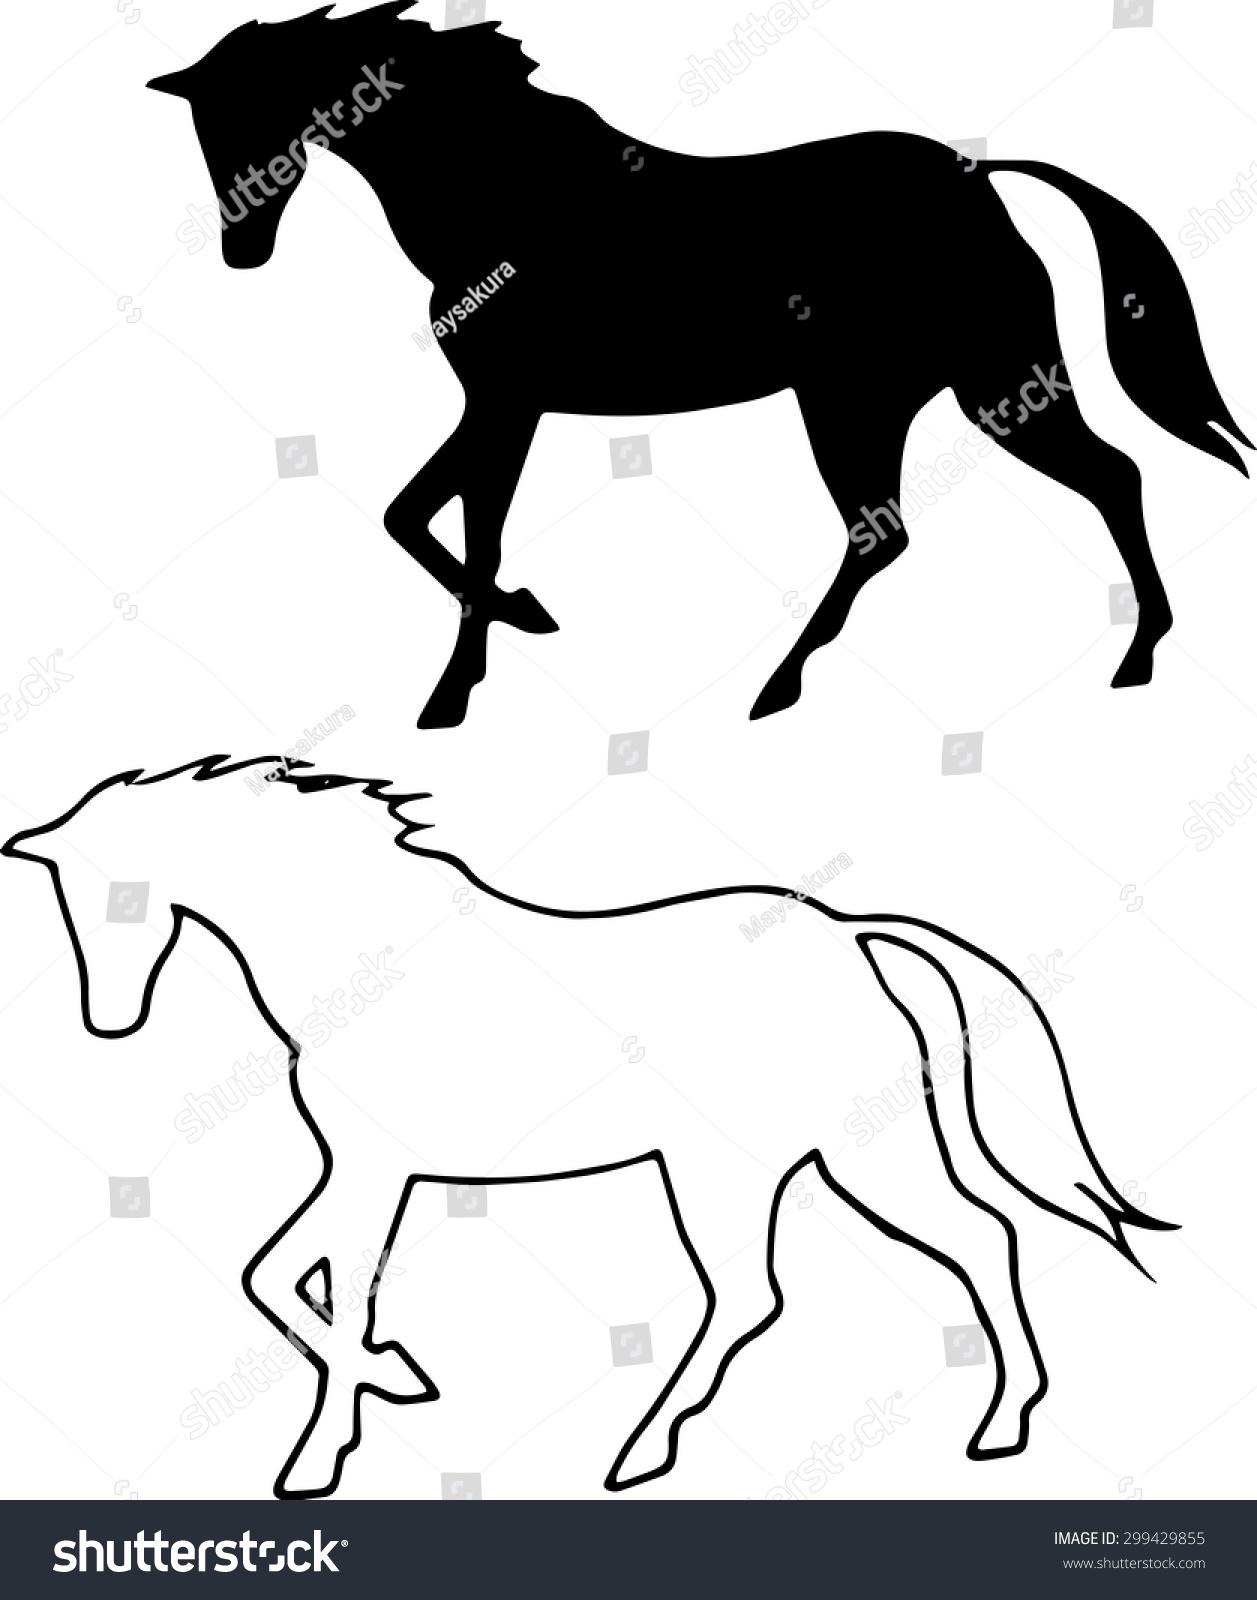 Vector Black Horse Silhouette Walking Horse Stock Vector Royalty Free 299429855